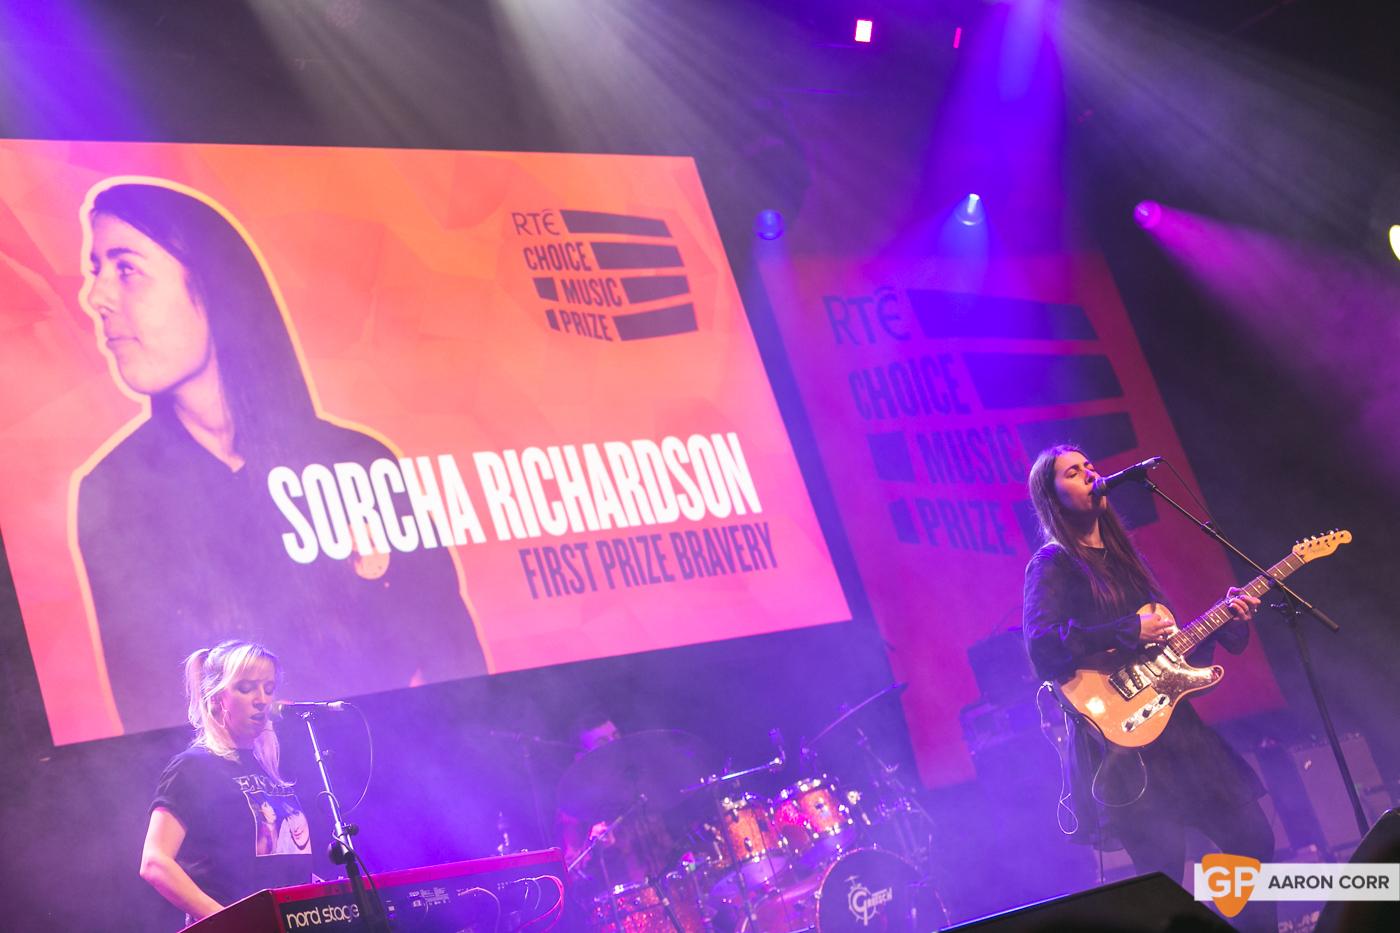 Sorcha Richardson at Choice Music Prize 2020 in Vicar Street, Dublin on 05-Mar-20 by Aaron Corr-5299